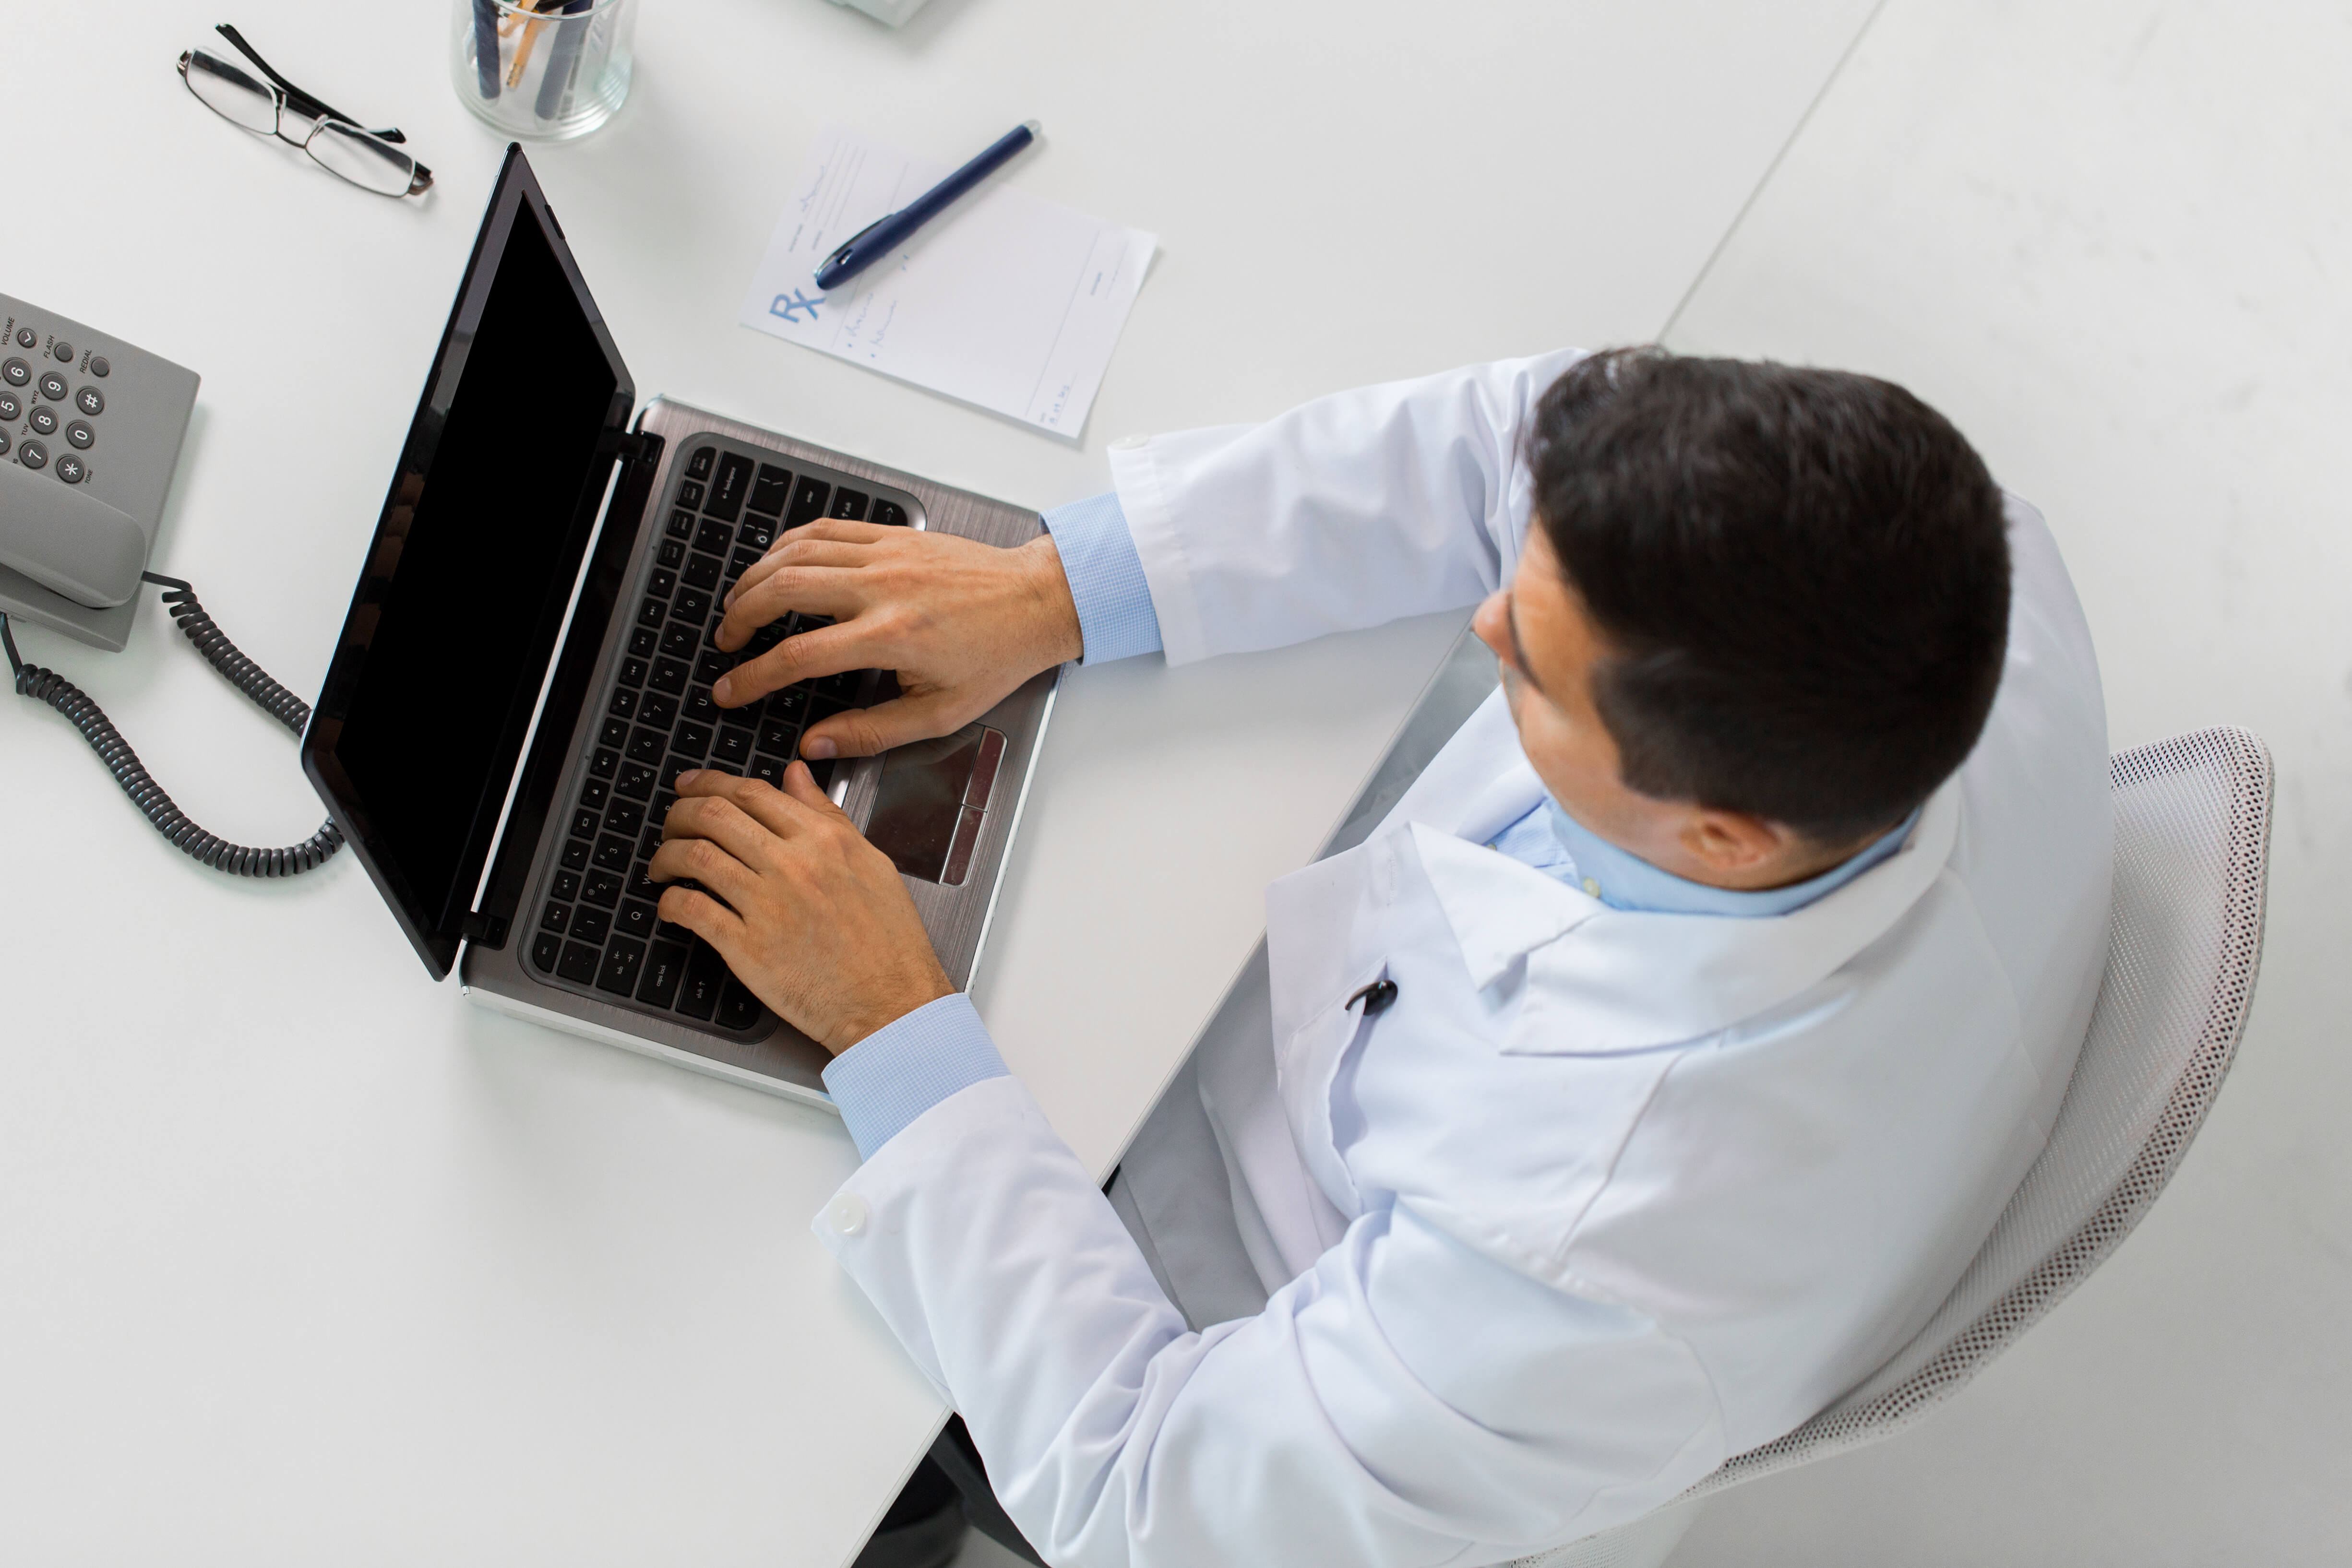 computer man phone pen white desk nurse triage jobs